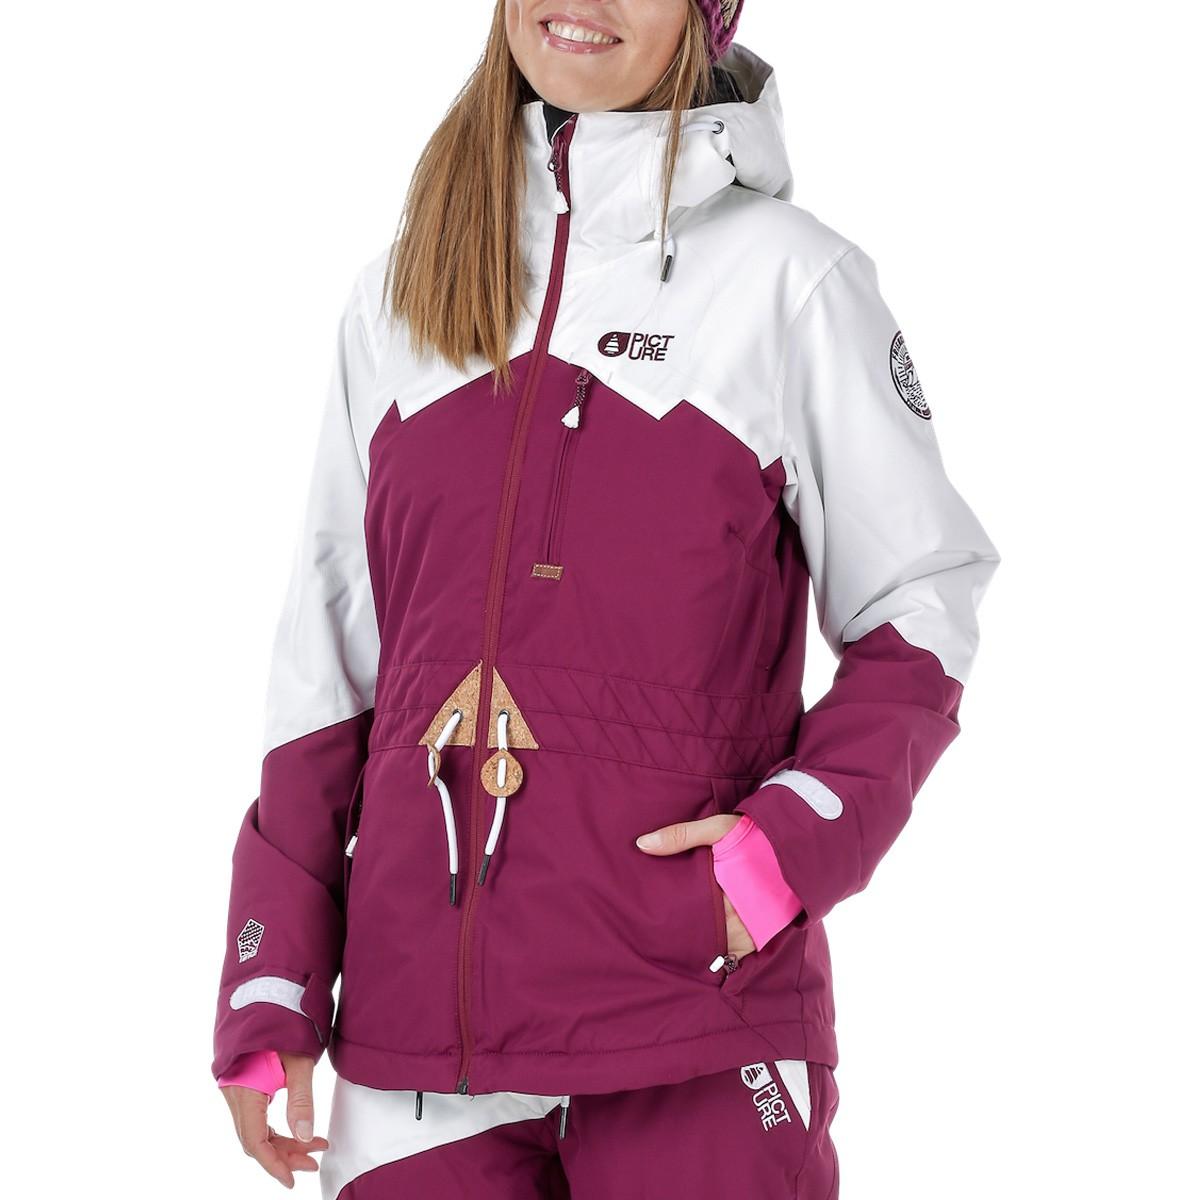 Chaquetas ski mujer